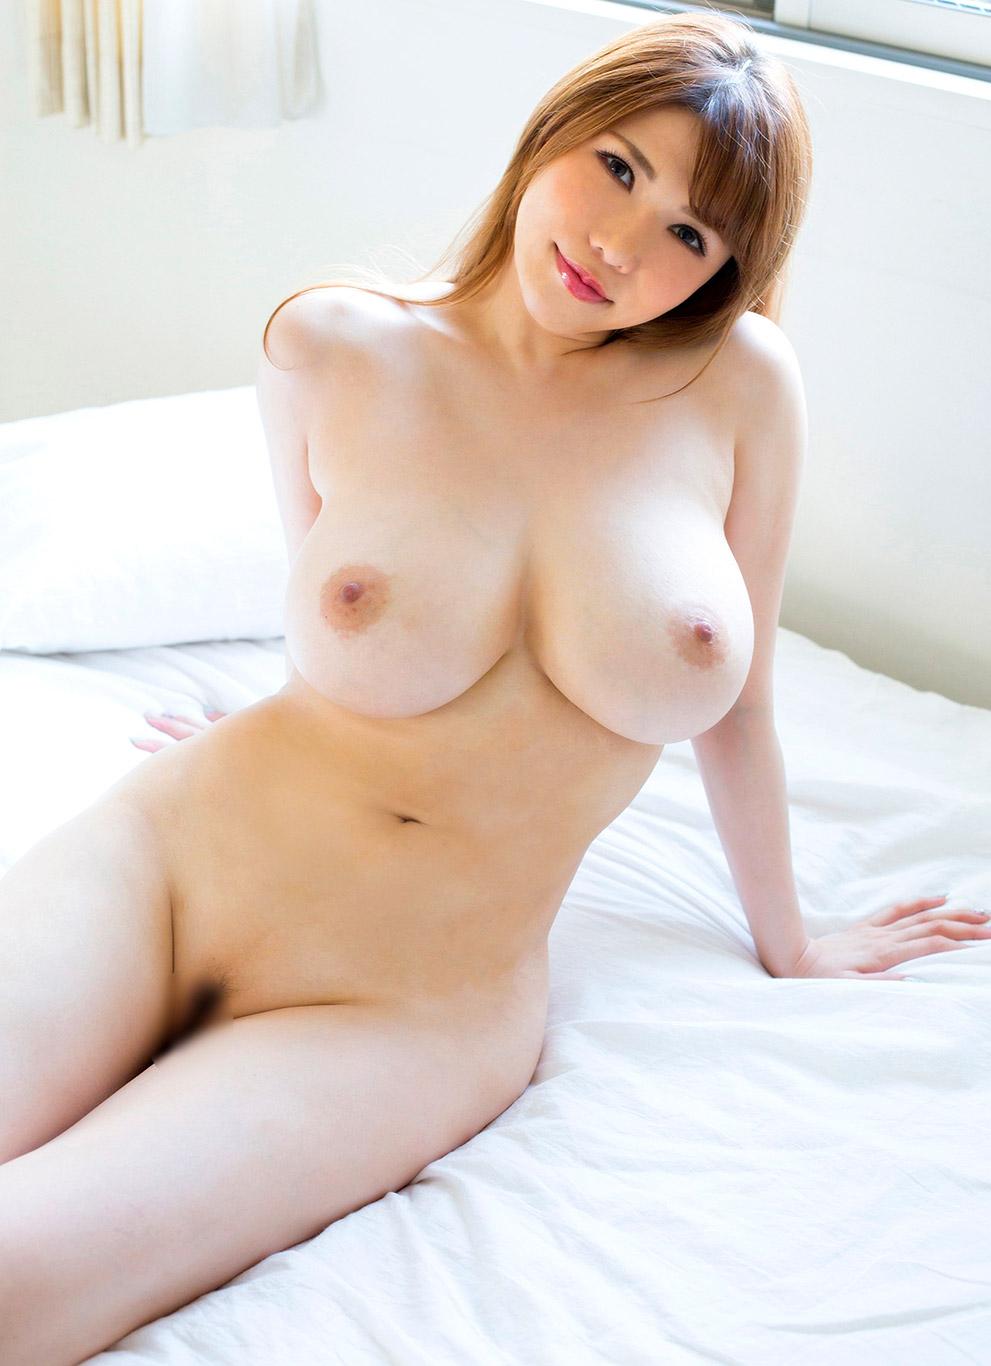 beautiful ladies naked photos